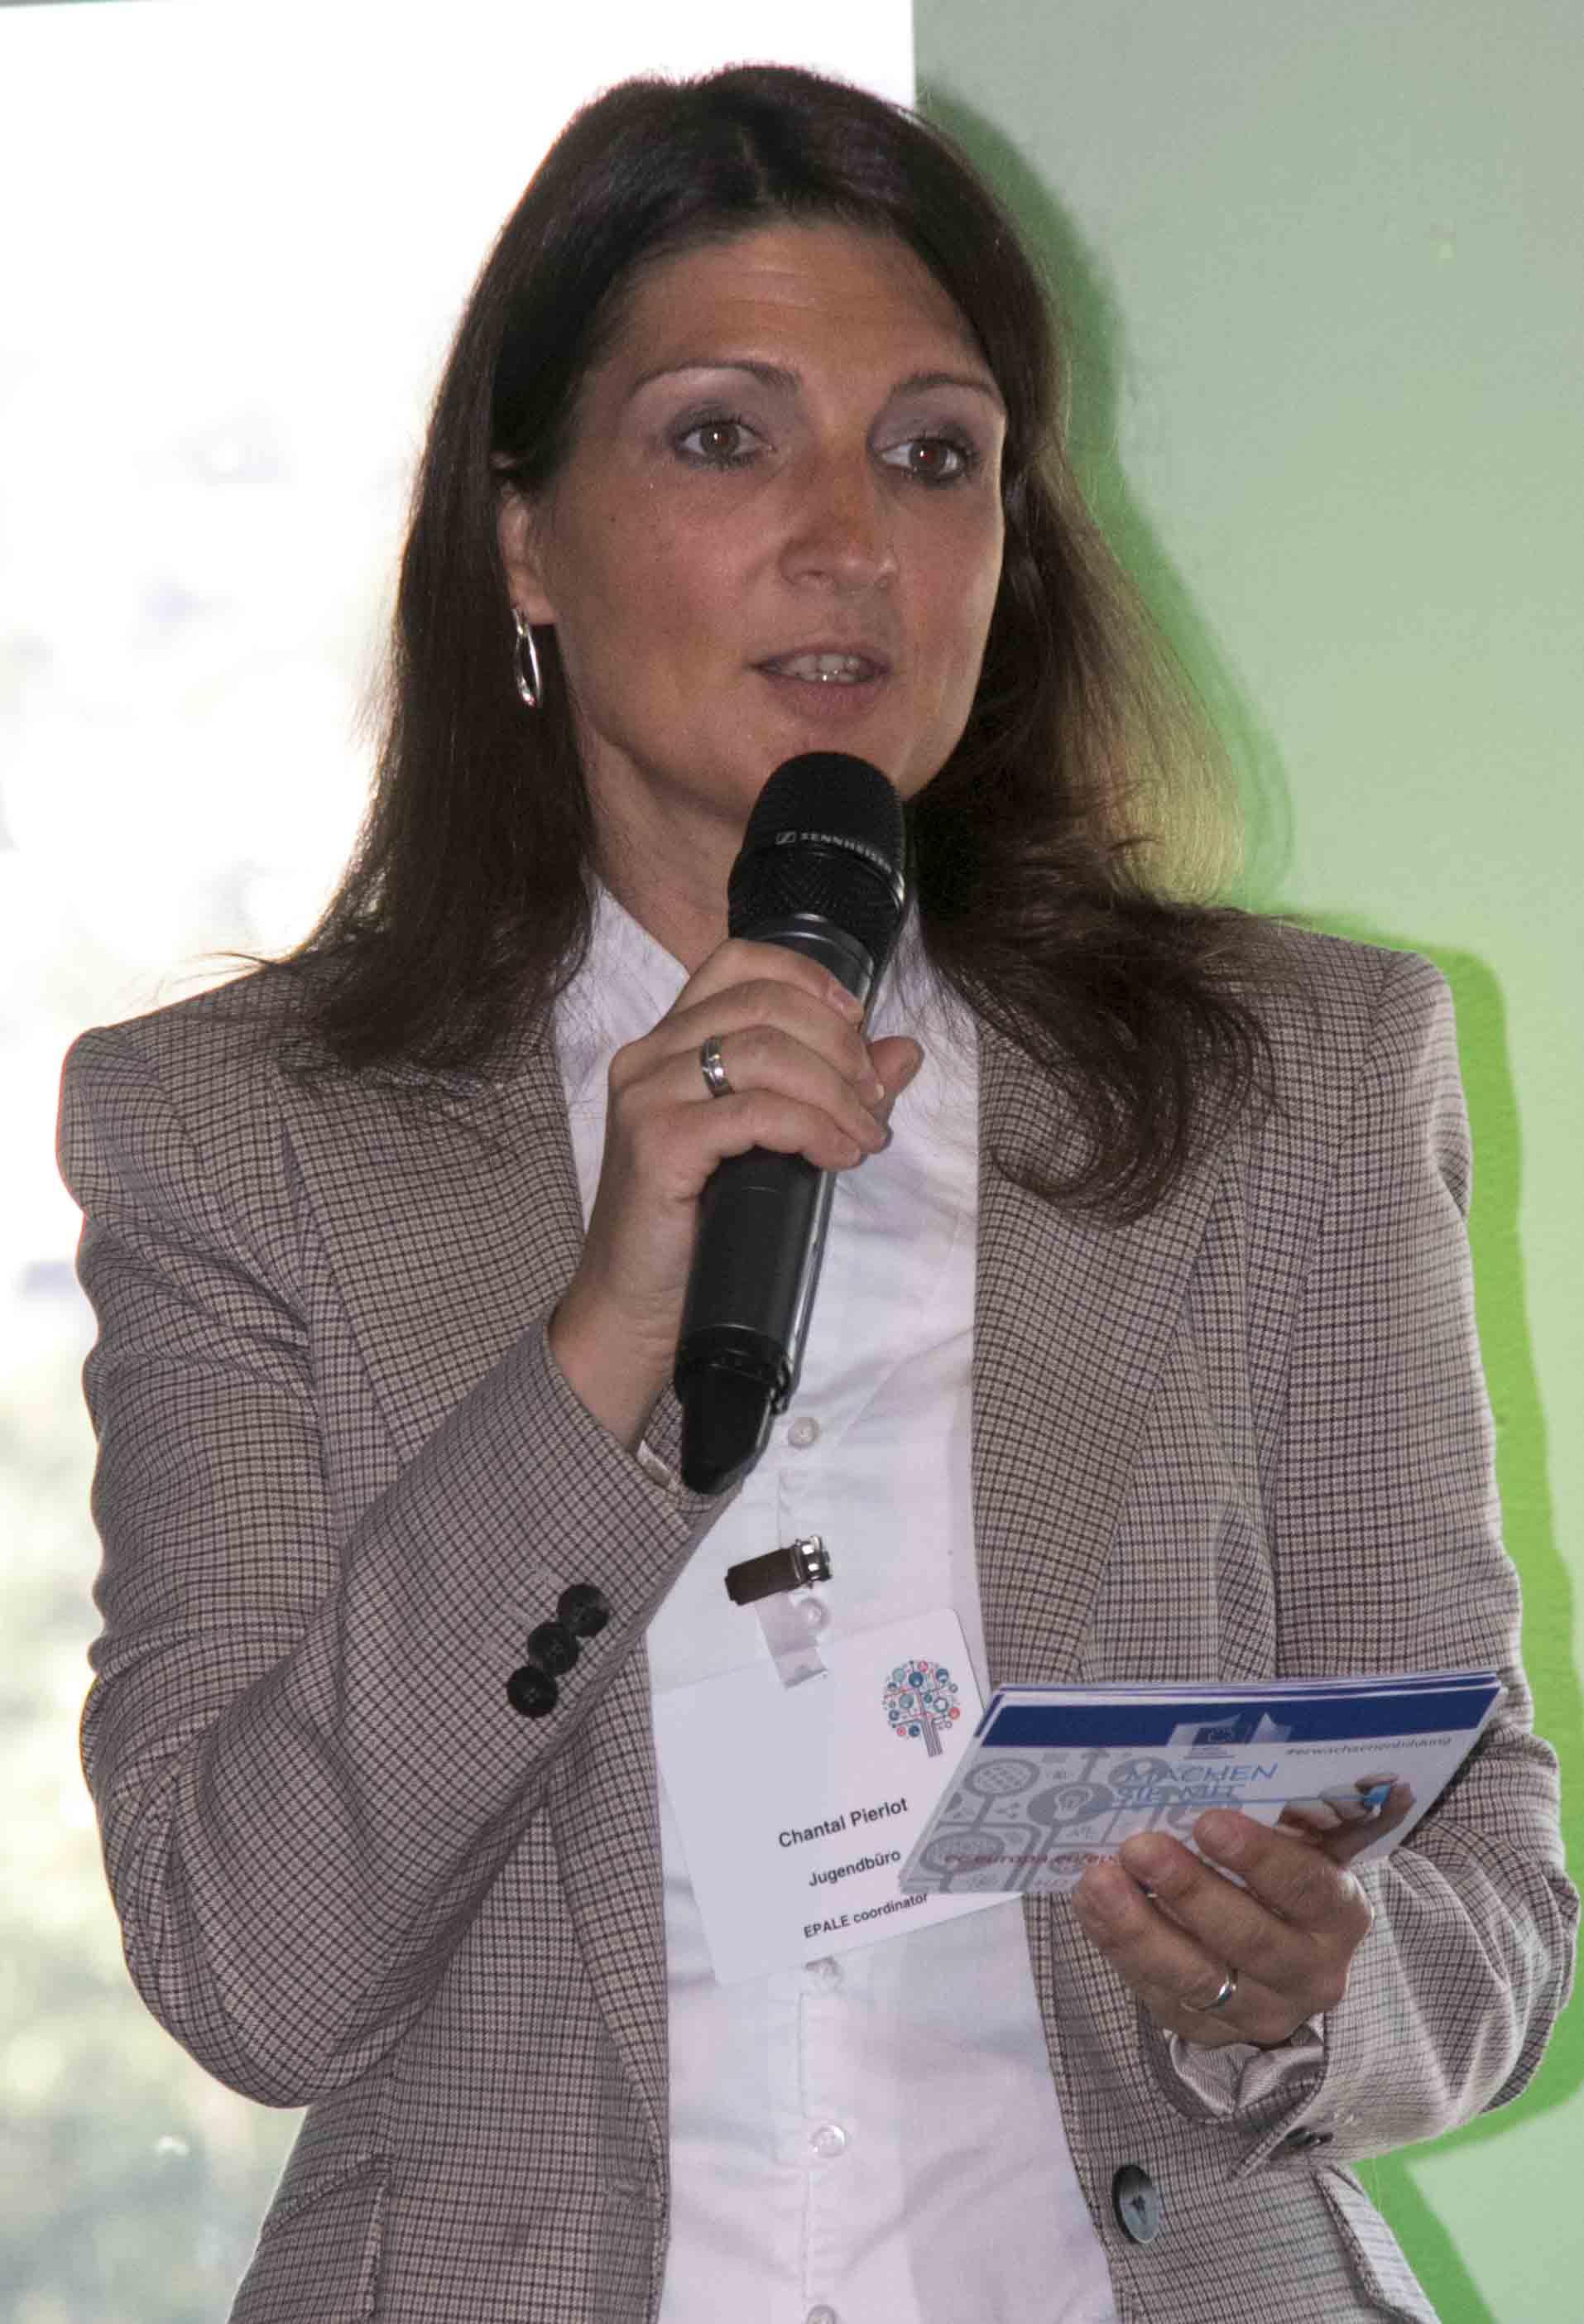 Chantal Pierlot